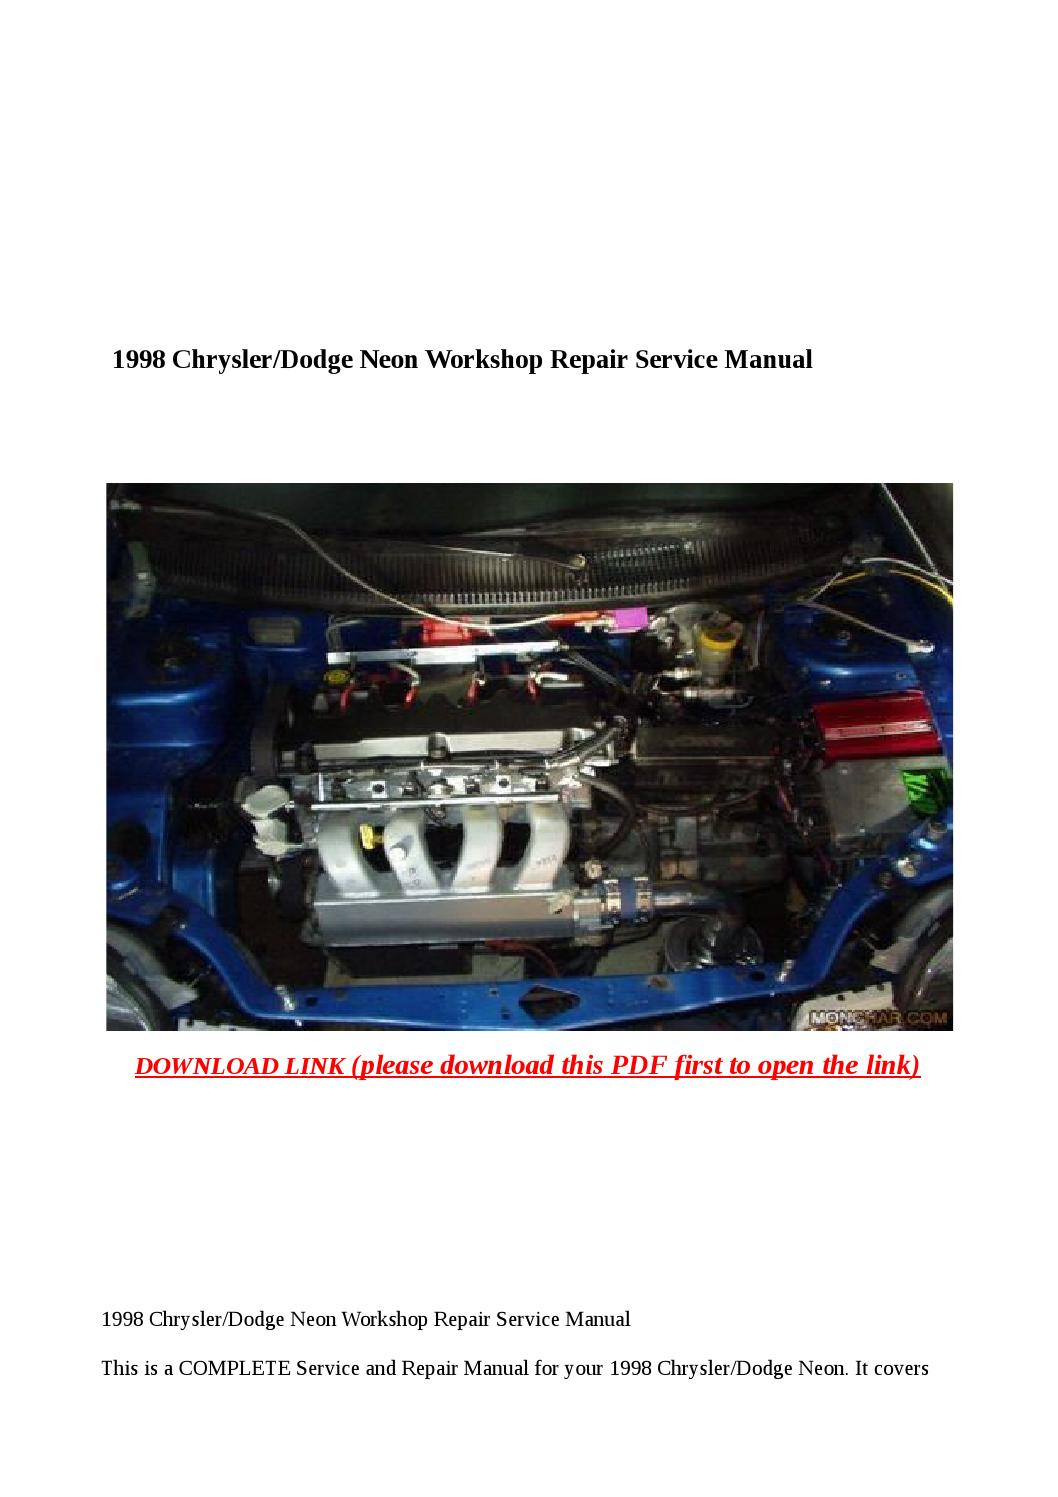 1998 chrysler dodge neon workshop repair service manual by ...